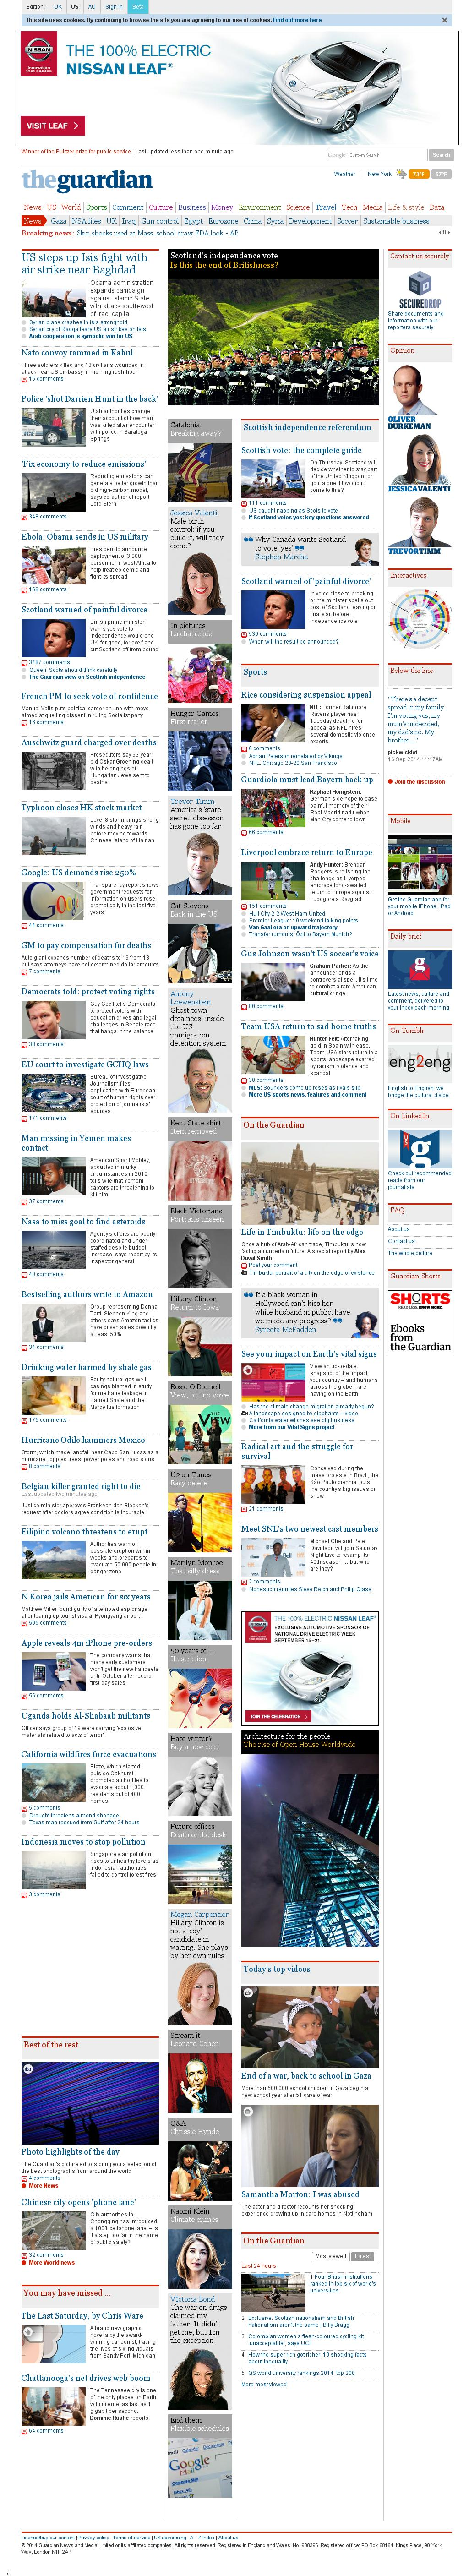 The Guardian at Tuesday Sept. 16, 2014, 12:06 p.m. UTC